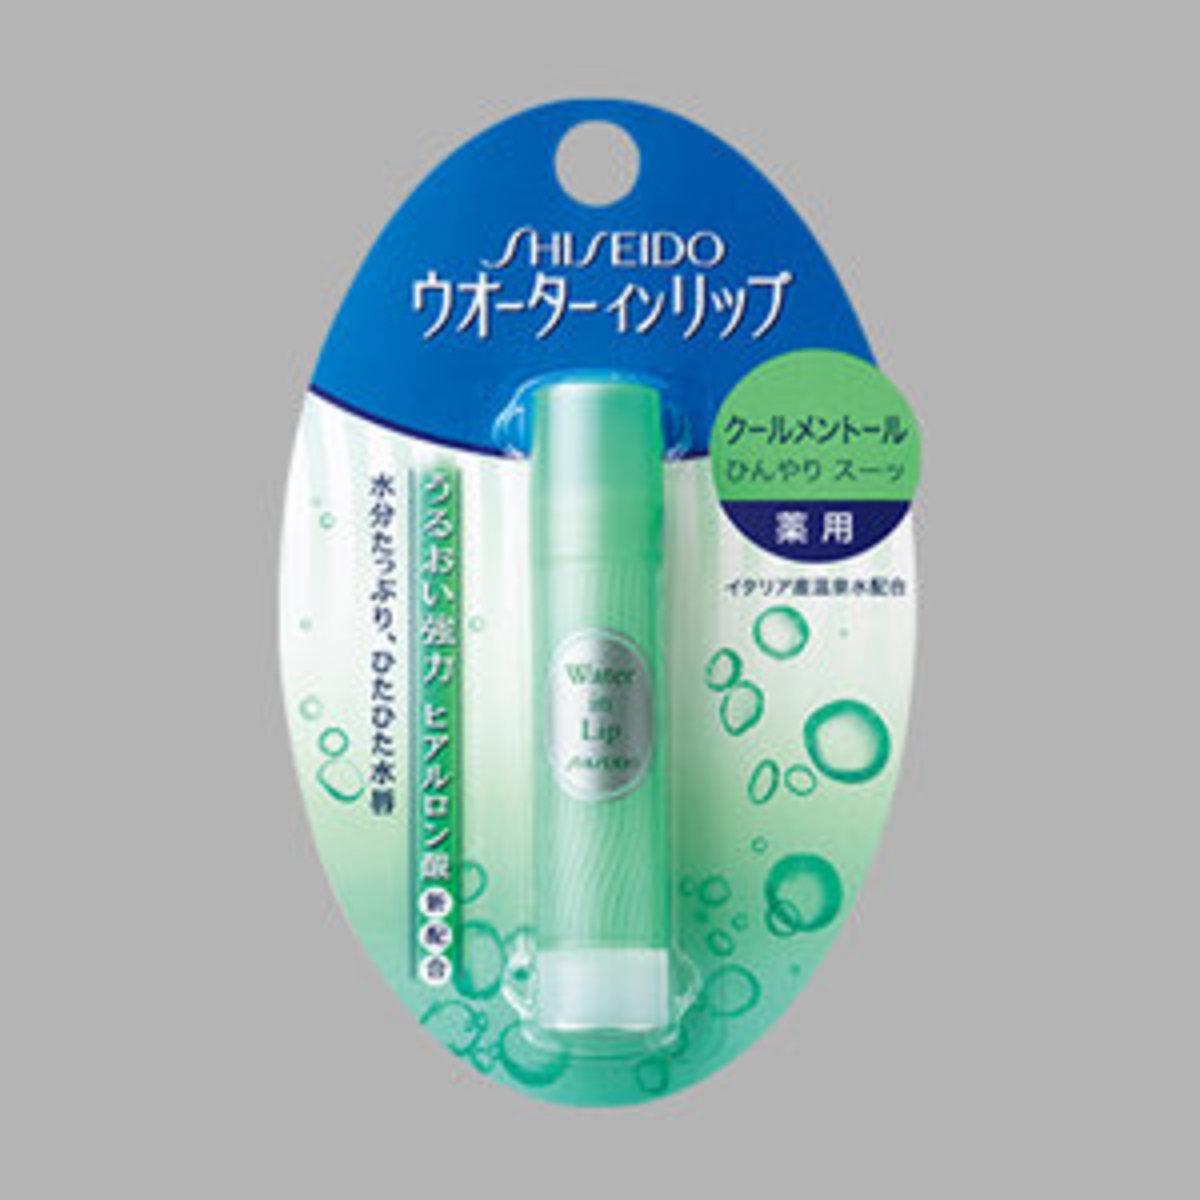 WIL medicinal cool mint lip balm 3.5g